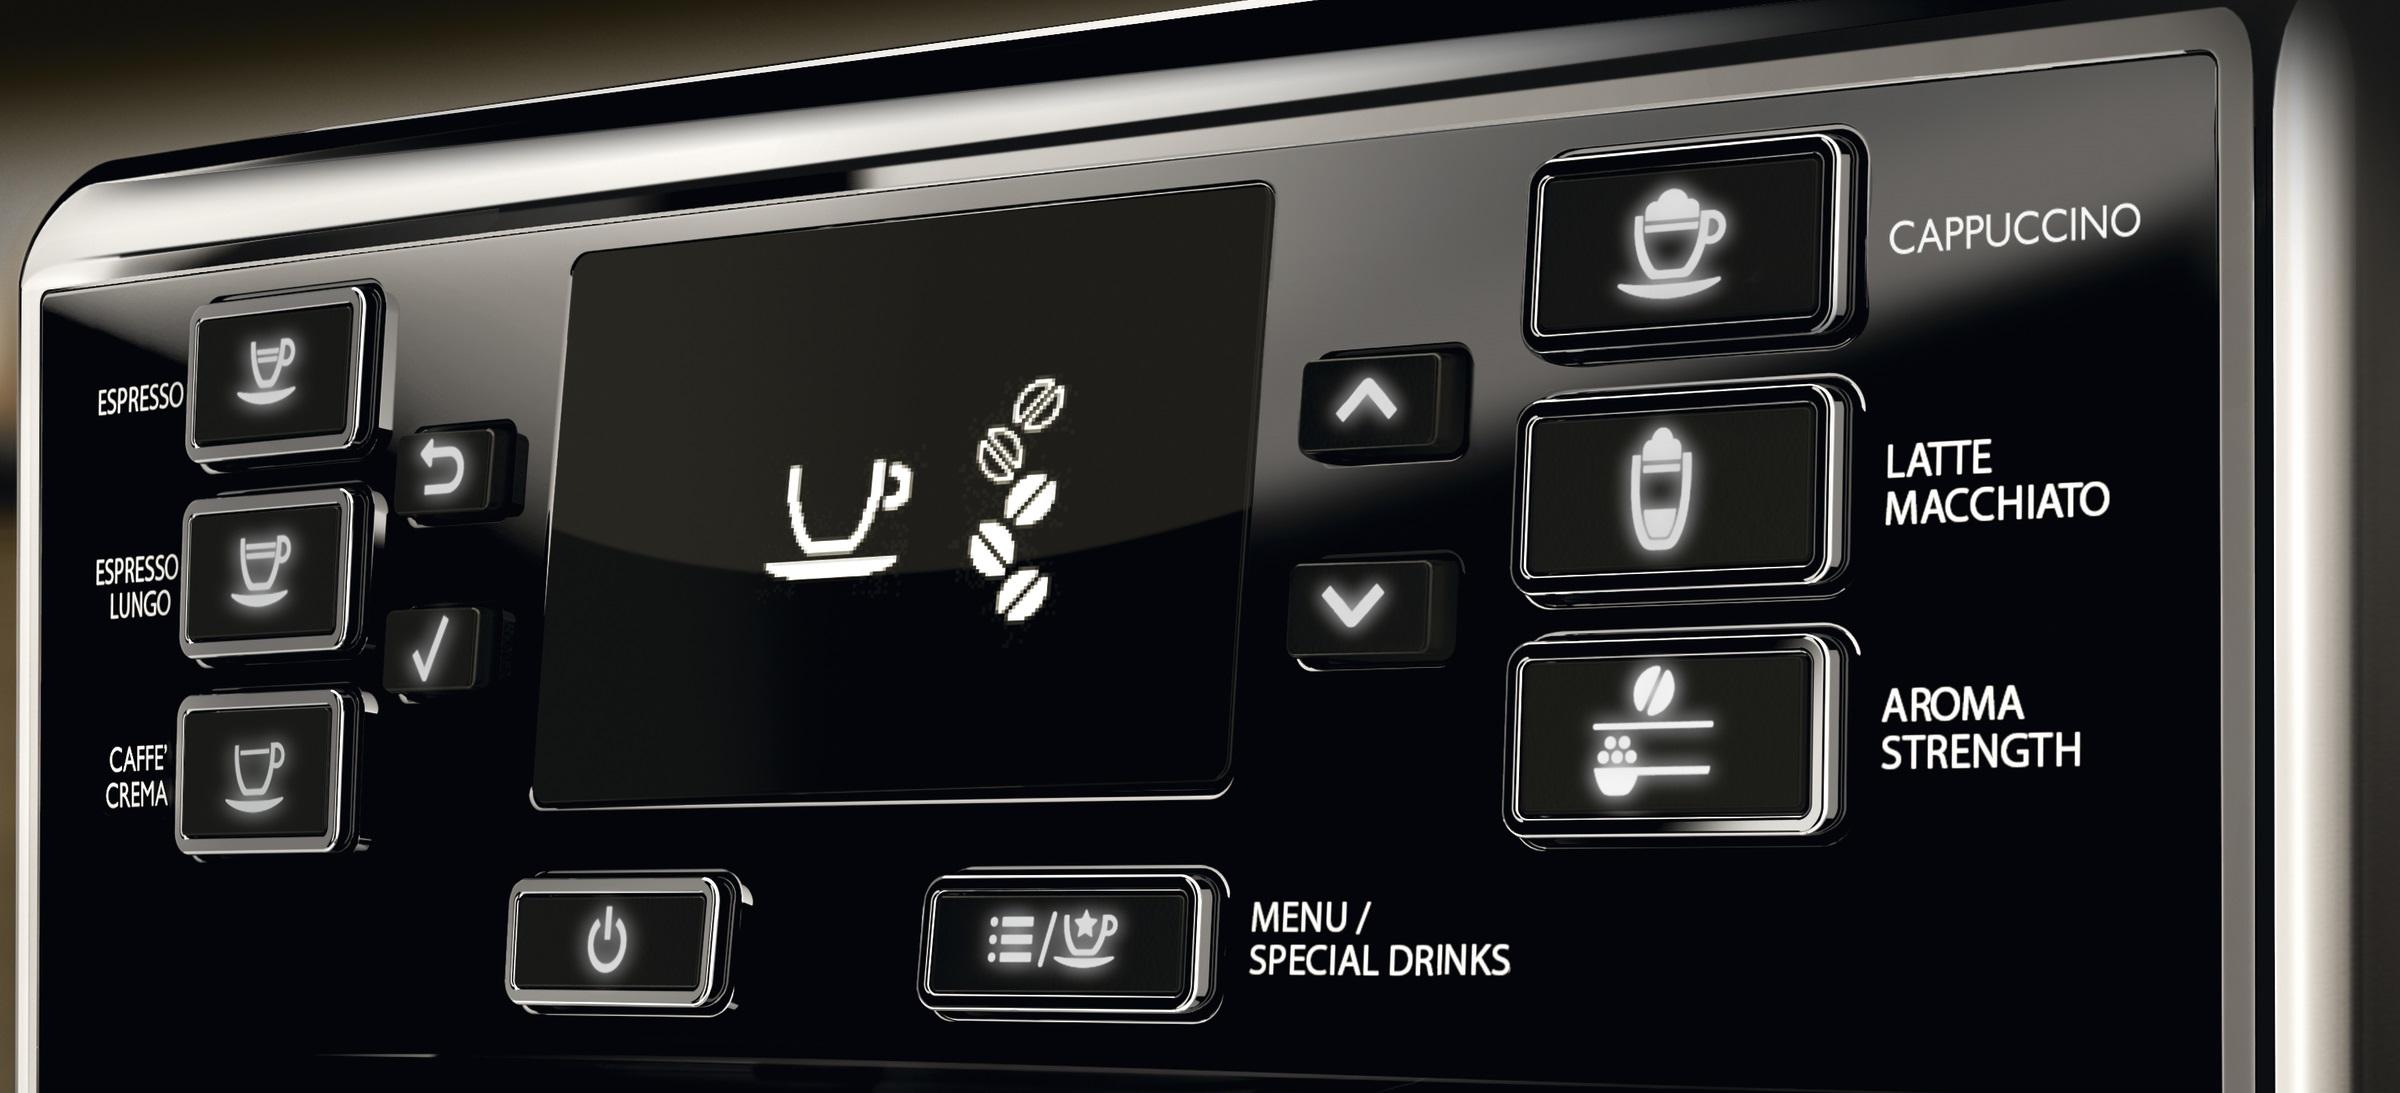 Philips espressomachine Saeco display